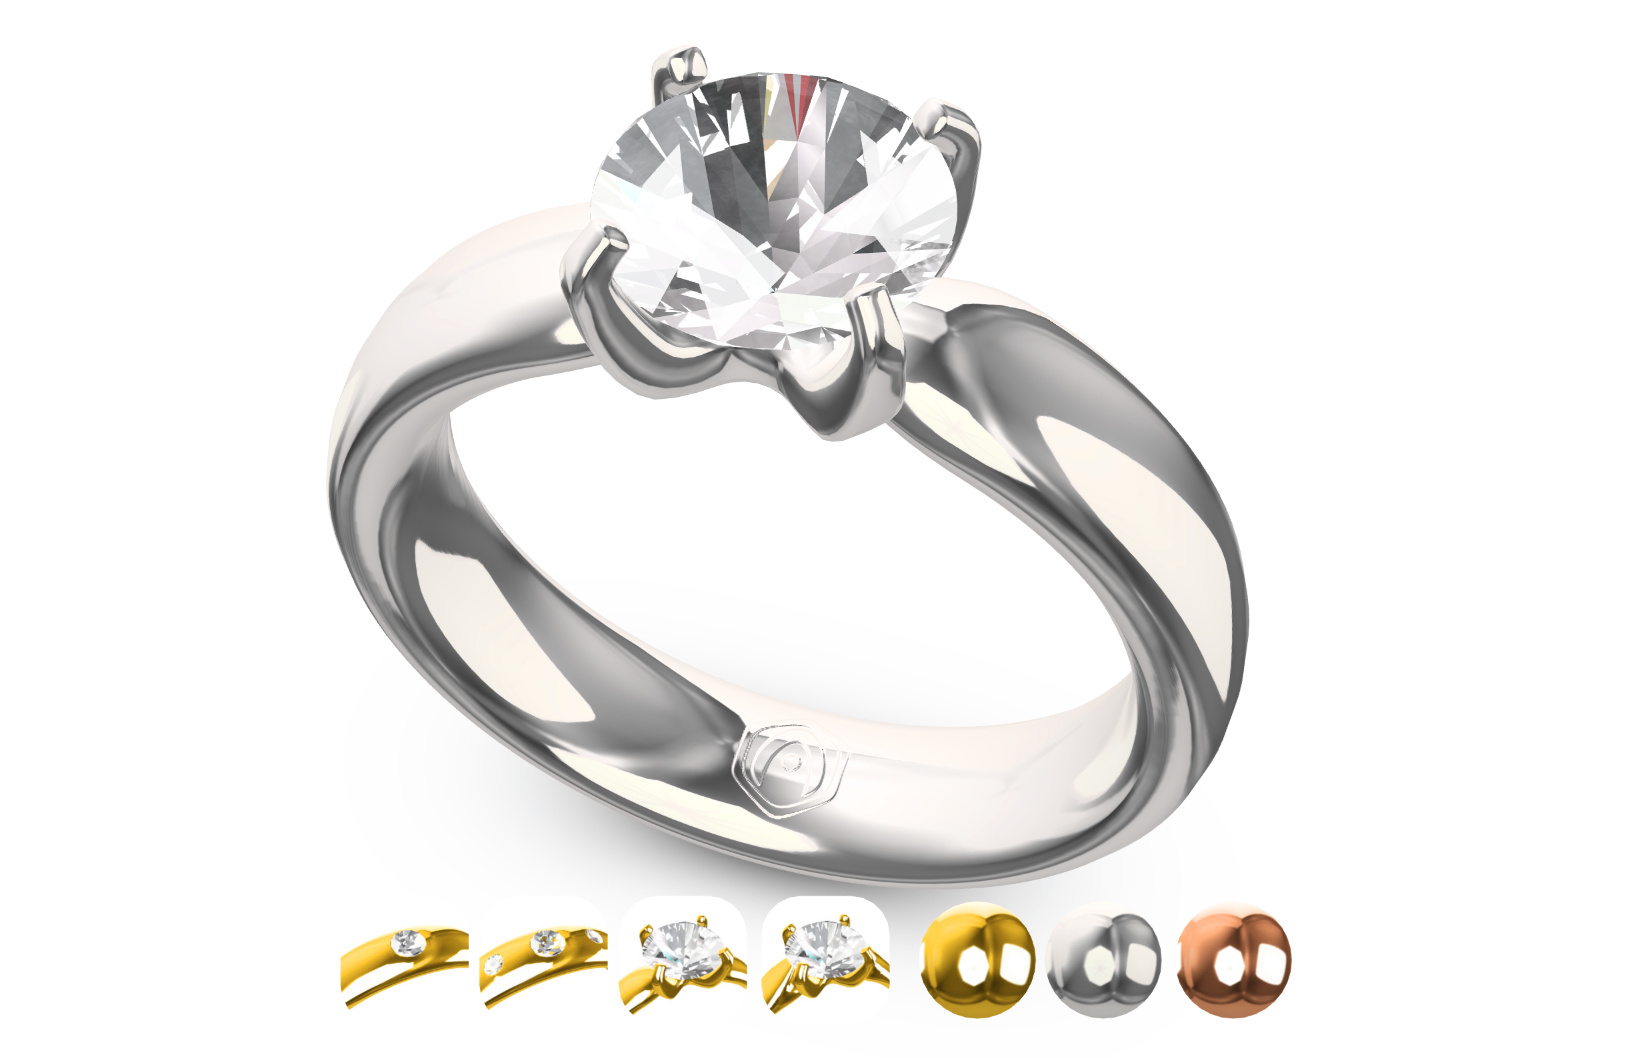 Verge3D Jewelry Configurator